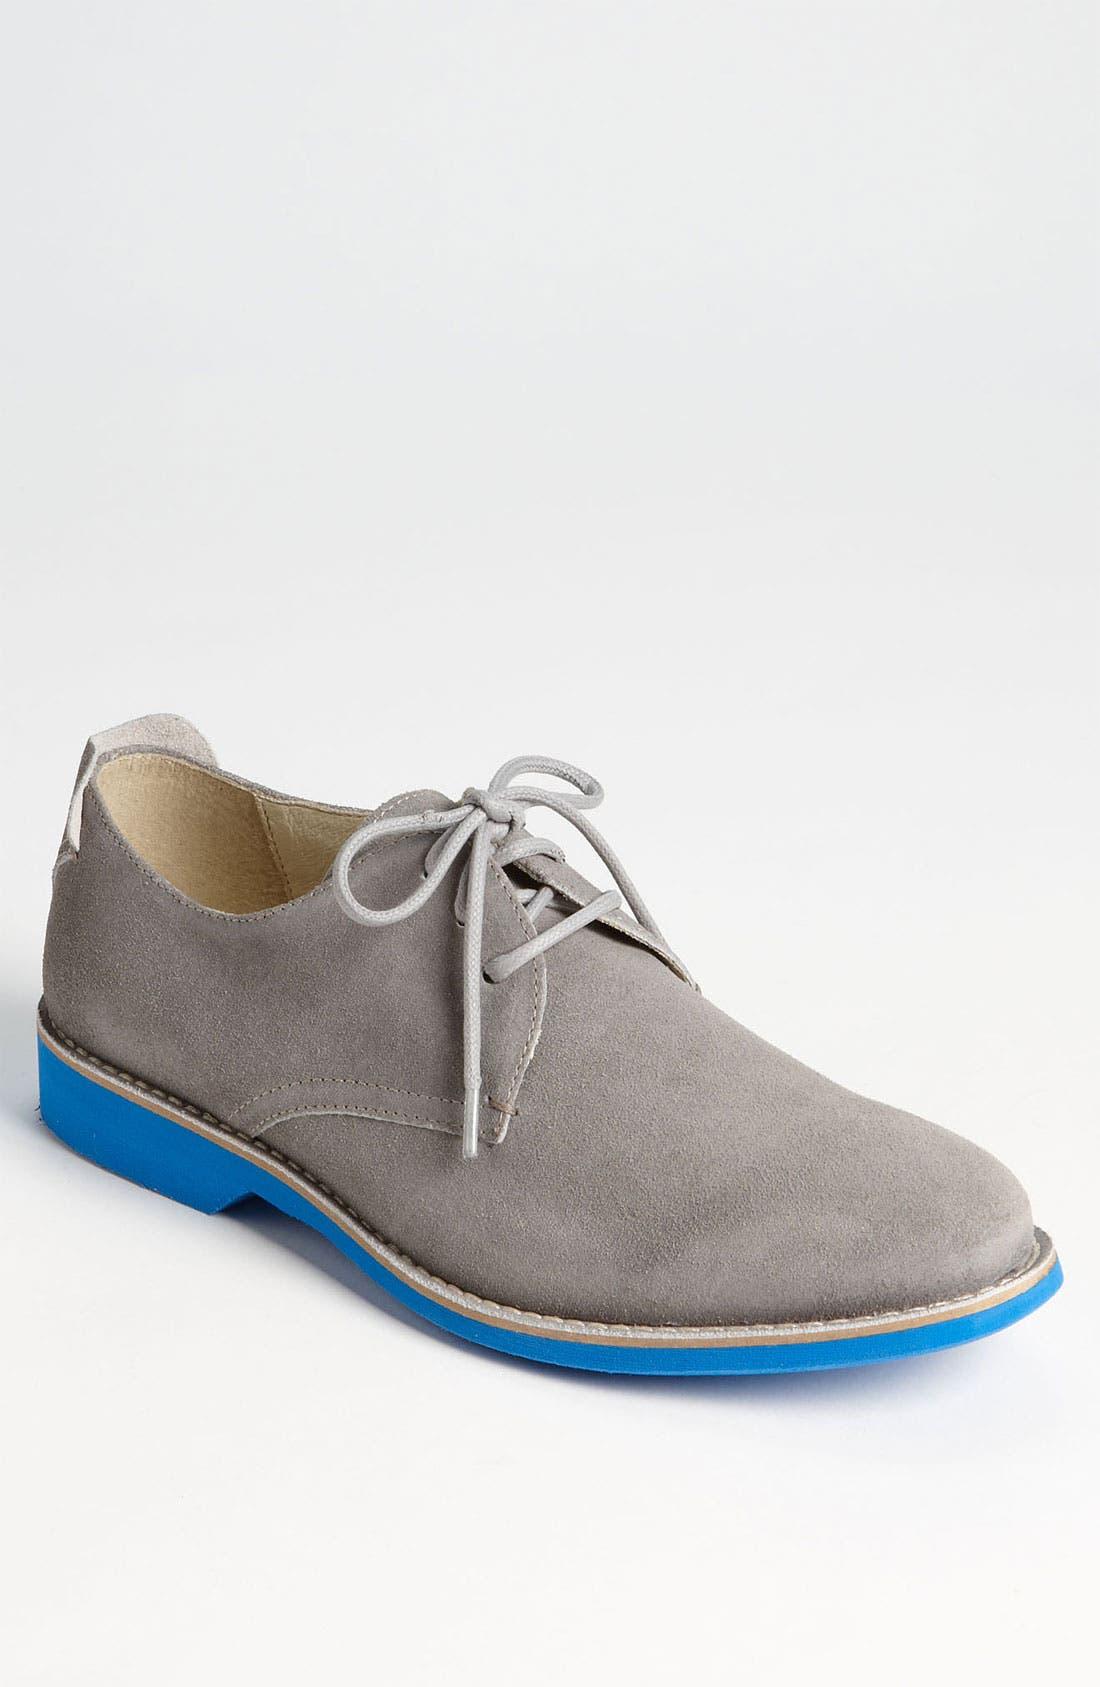 Alternate Image 1 Selected - ALDO 'Arkin' Buck Shoe